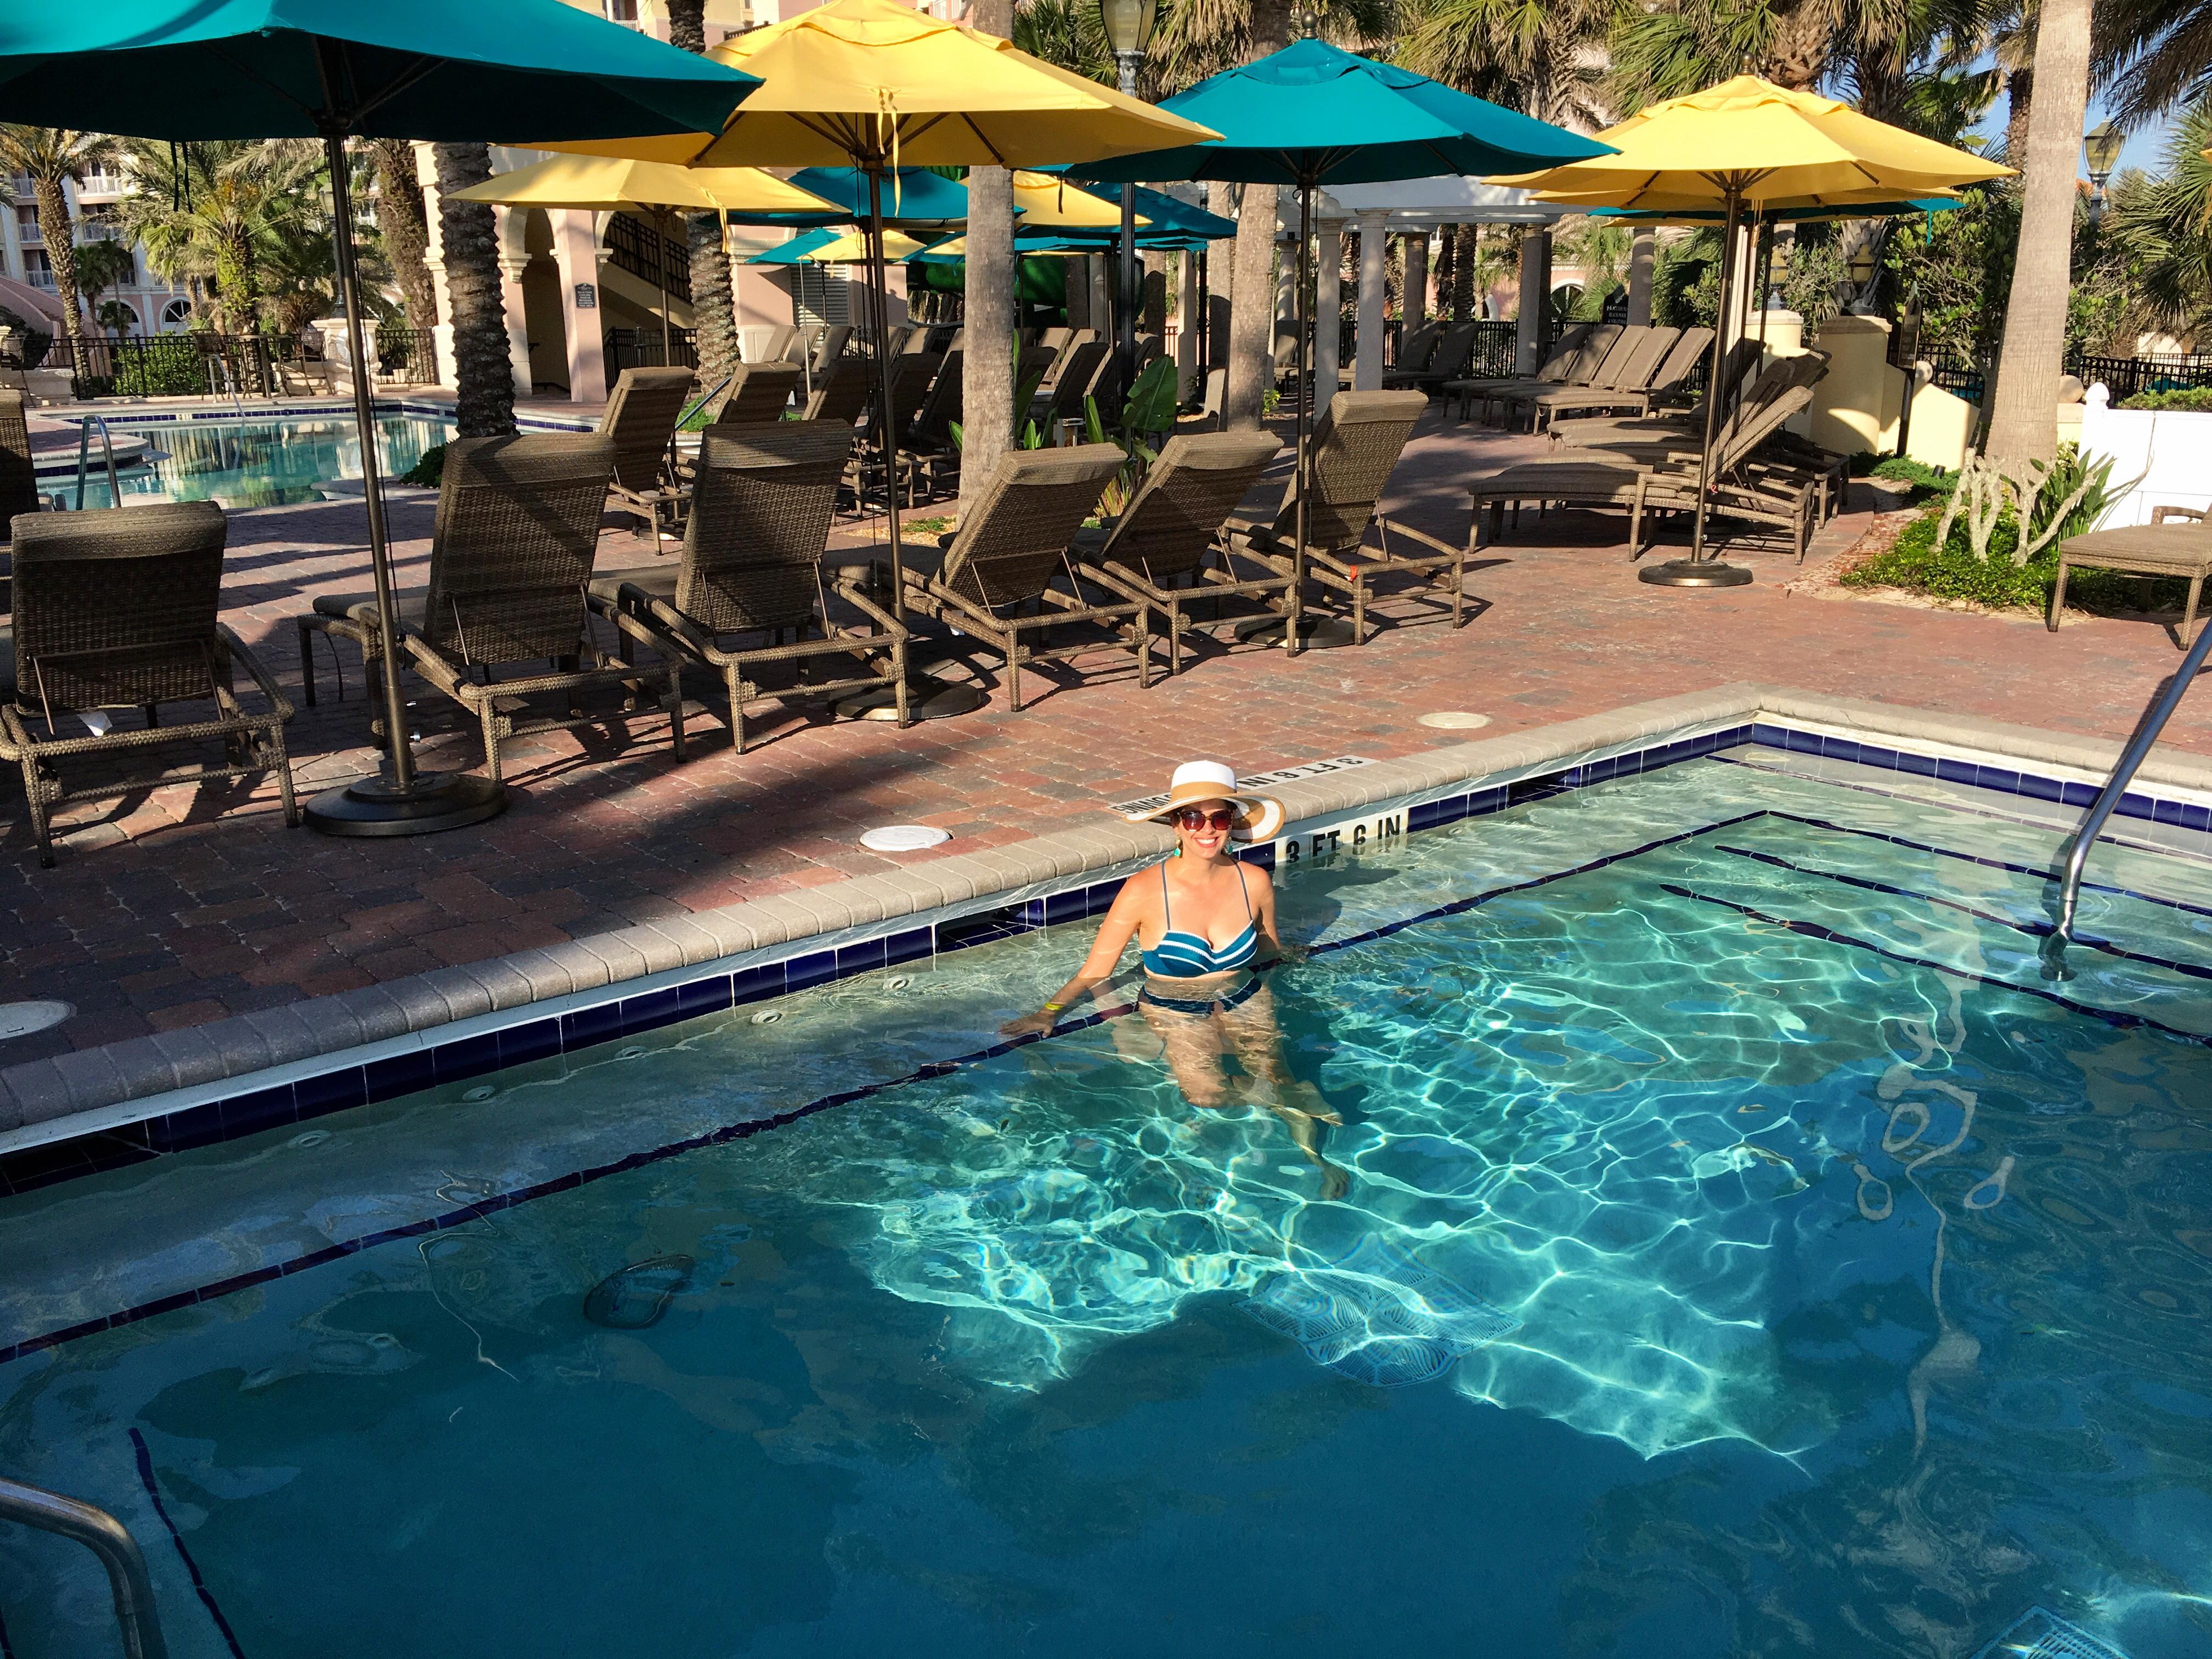 Hammock Beach Resort's Hot Tub Pool